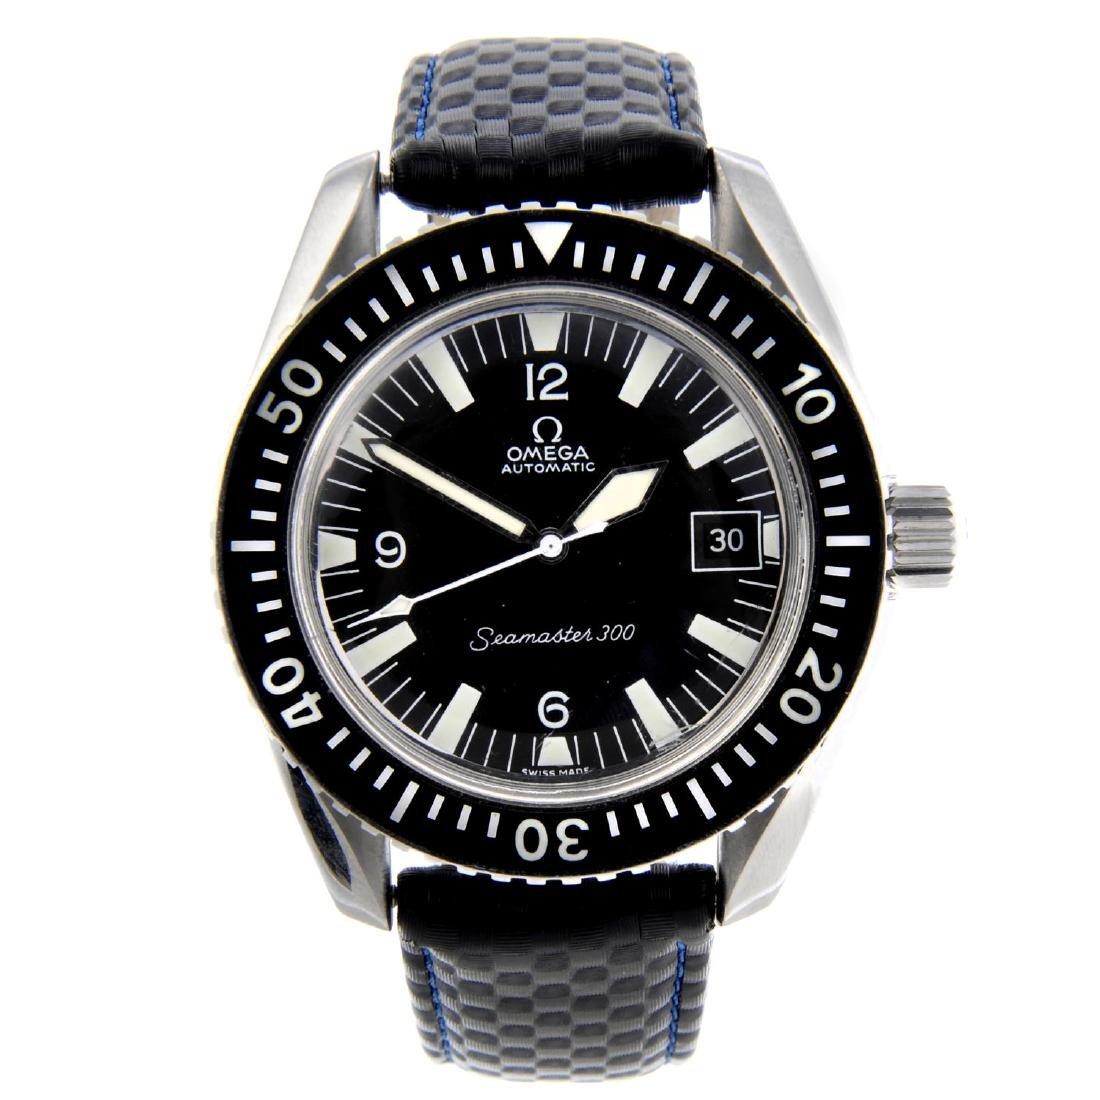 OMEGA - a gentleman's Seamaster 300M by WatchCo wrist